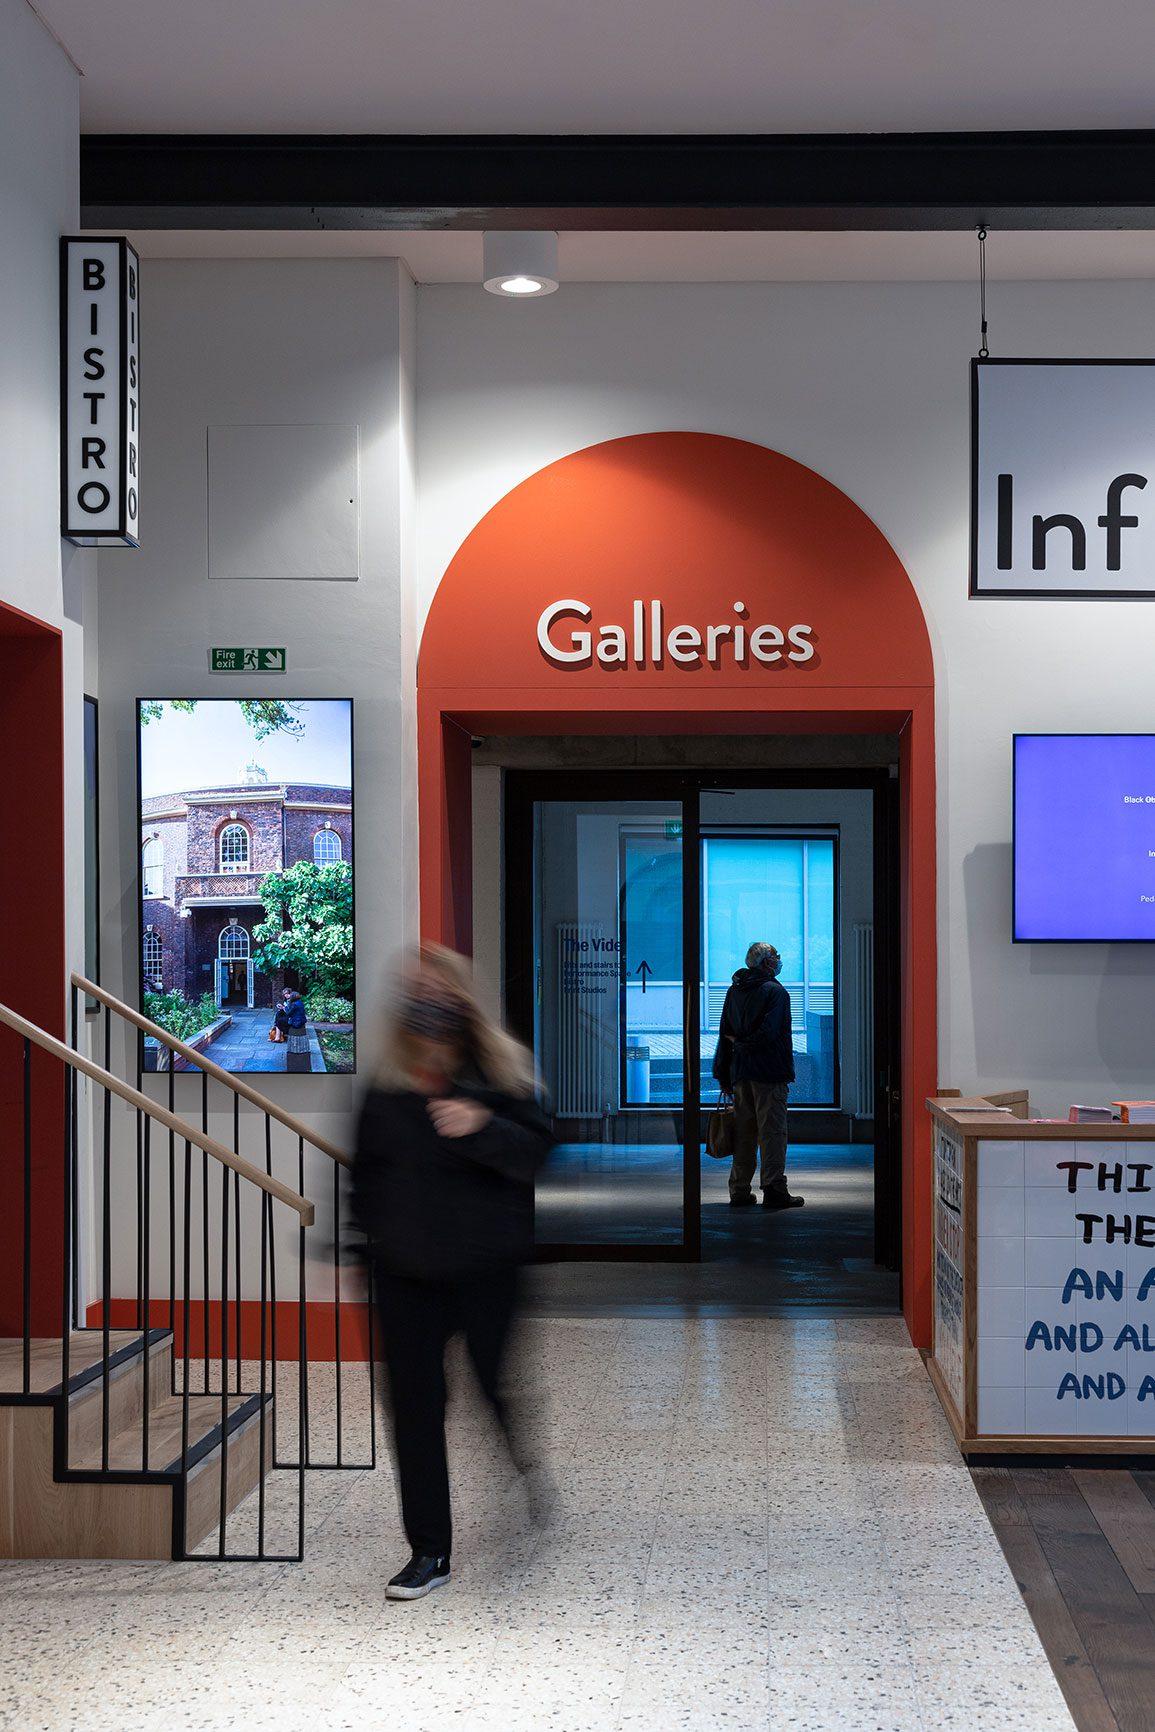 Bluecoat Arts Centre Liverpool Architectural Emporium Gallery Entrance. Photo: Matthew Westgate